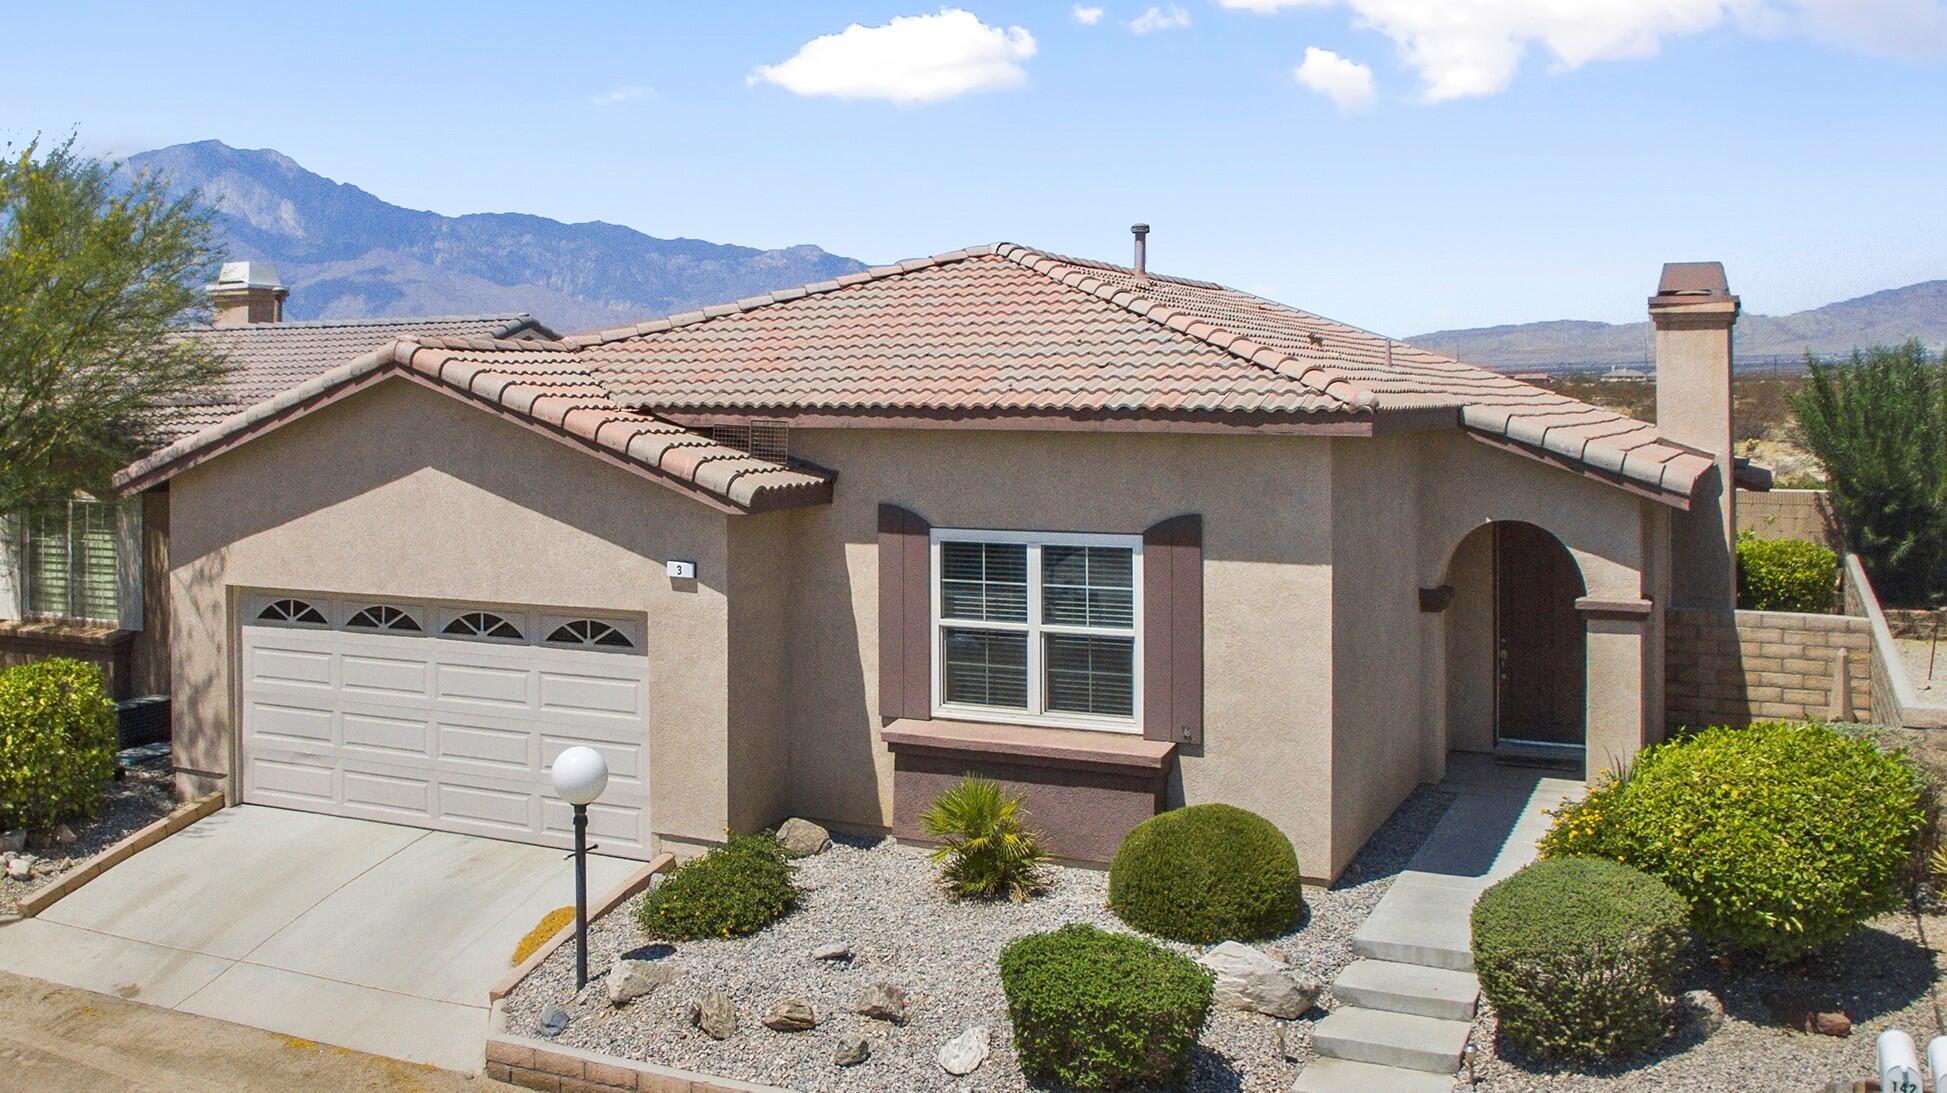 Photo of 65565 Acoma Avenue #3, Desert Hot Springs, CA 92240